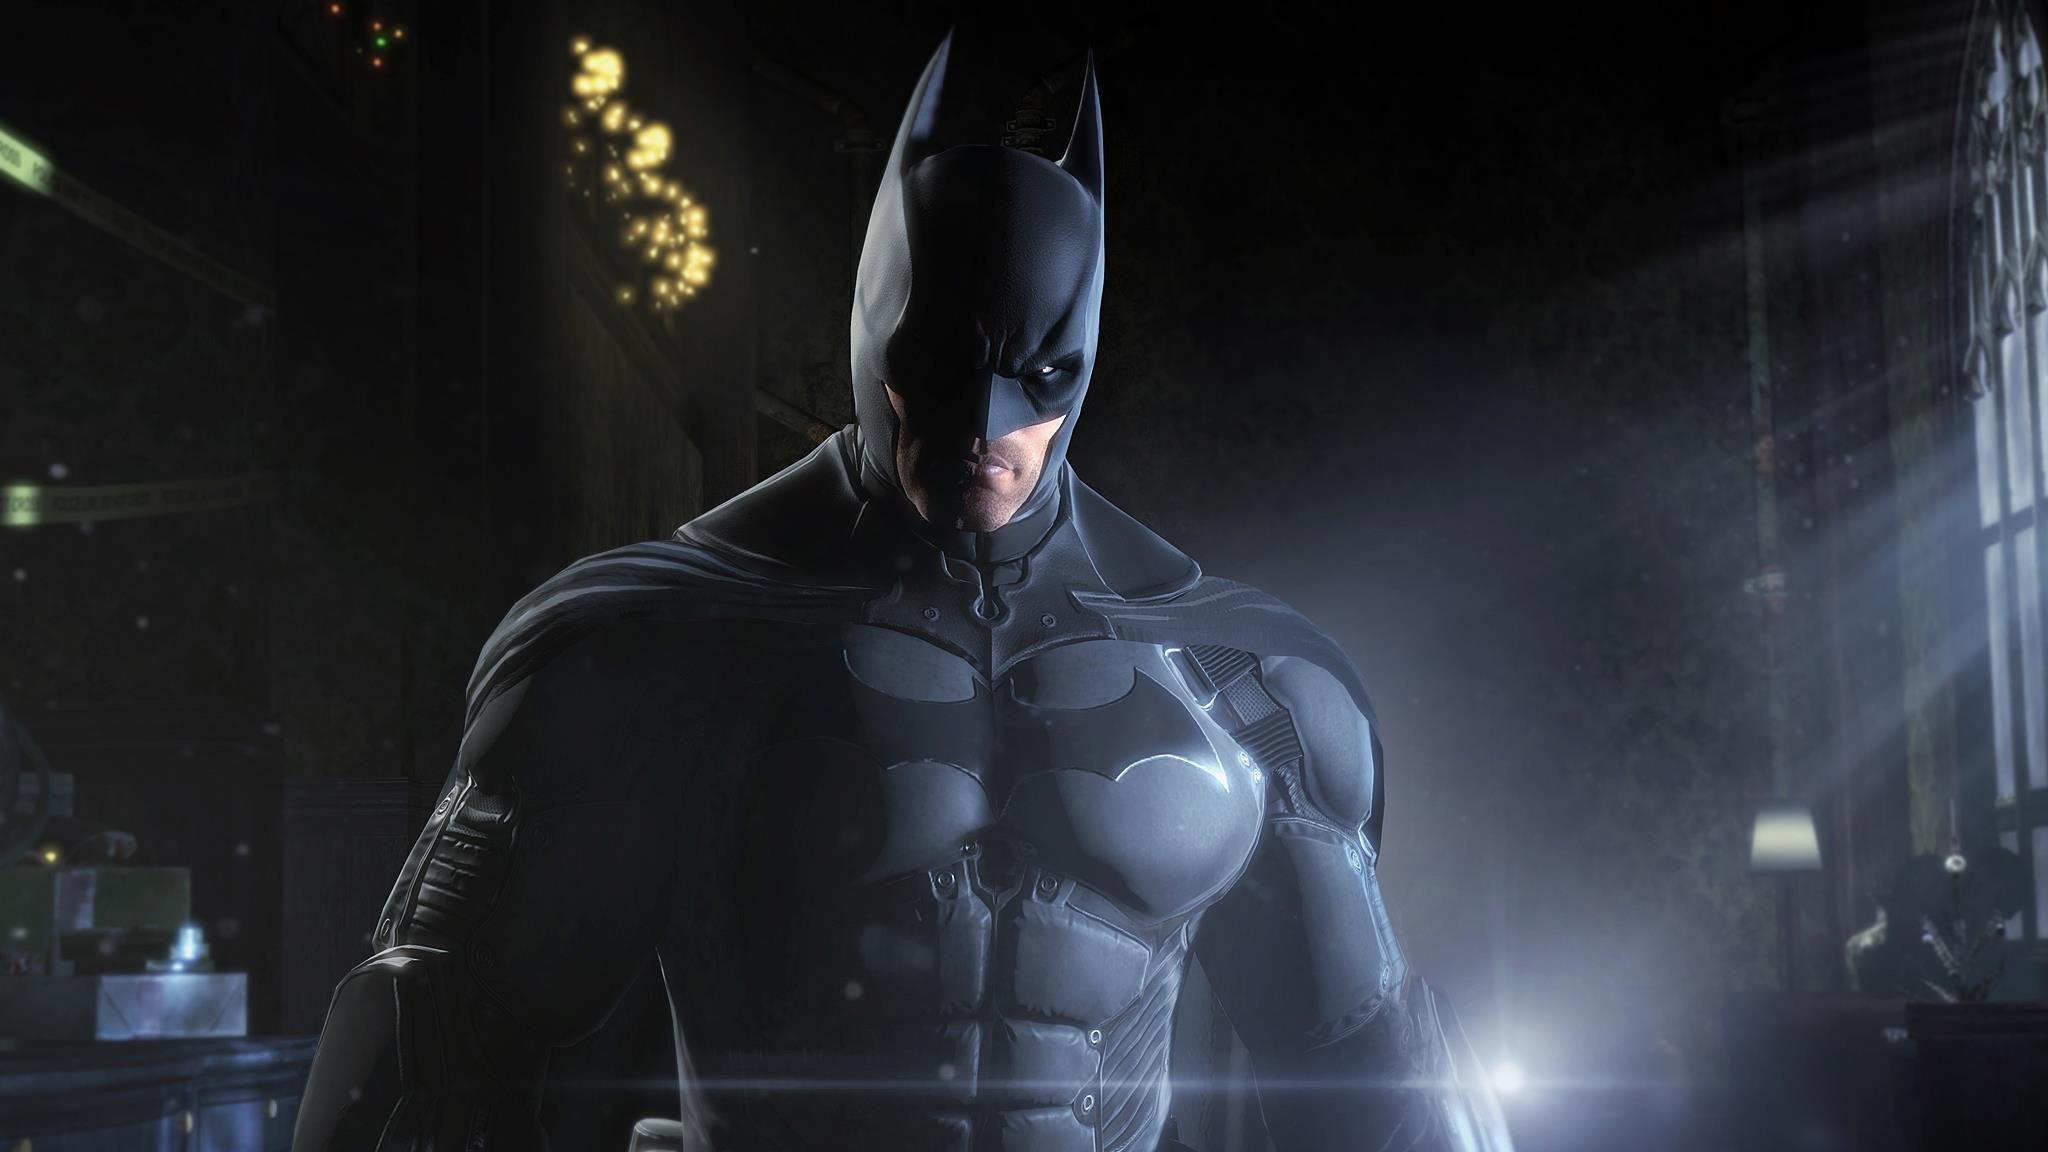 Batman: Arkham Origins Full HD Wallpaper And Background